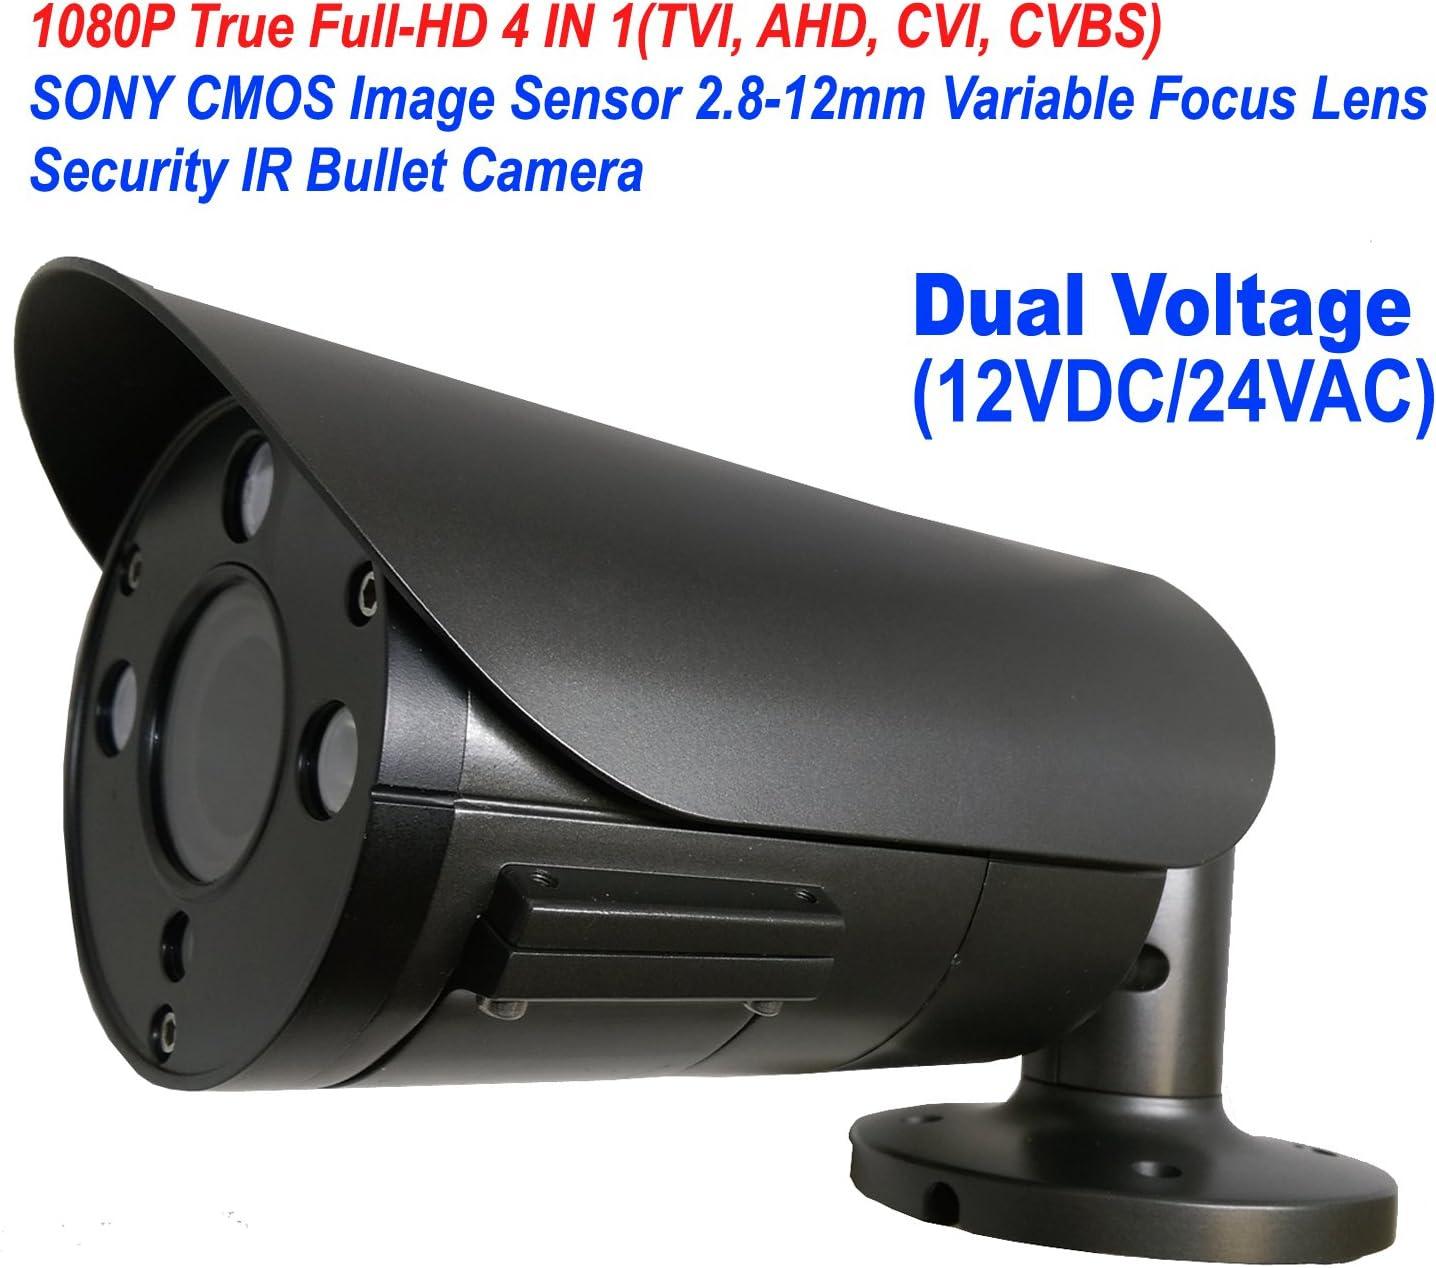 101AV 1080P True Full-HD Security Bullet Camera 4IN1(TVI, AHD, CVI, CVBS) 2.1Megapixel CMOS Image Sensor 2.8-12mm Variablefocus Lens IR in/Outdoor Auto Iris OSD Dual Voltage 12VDC/24VAC Charcoal 71Jkg1e6cWL